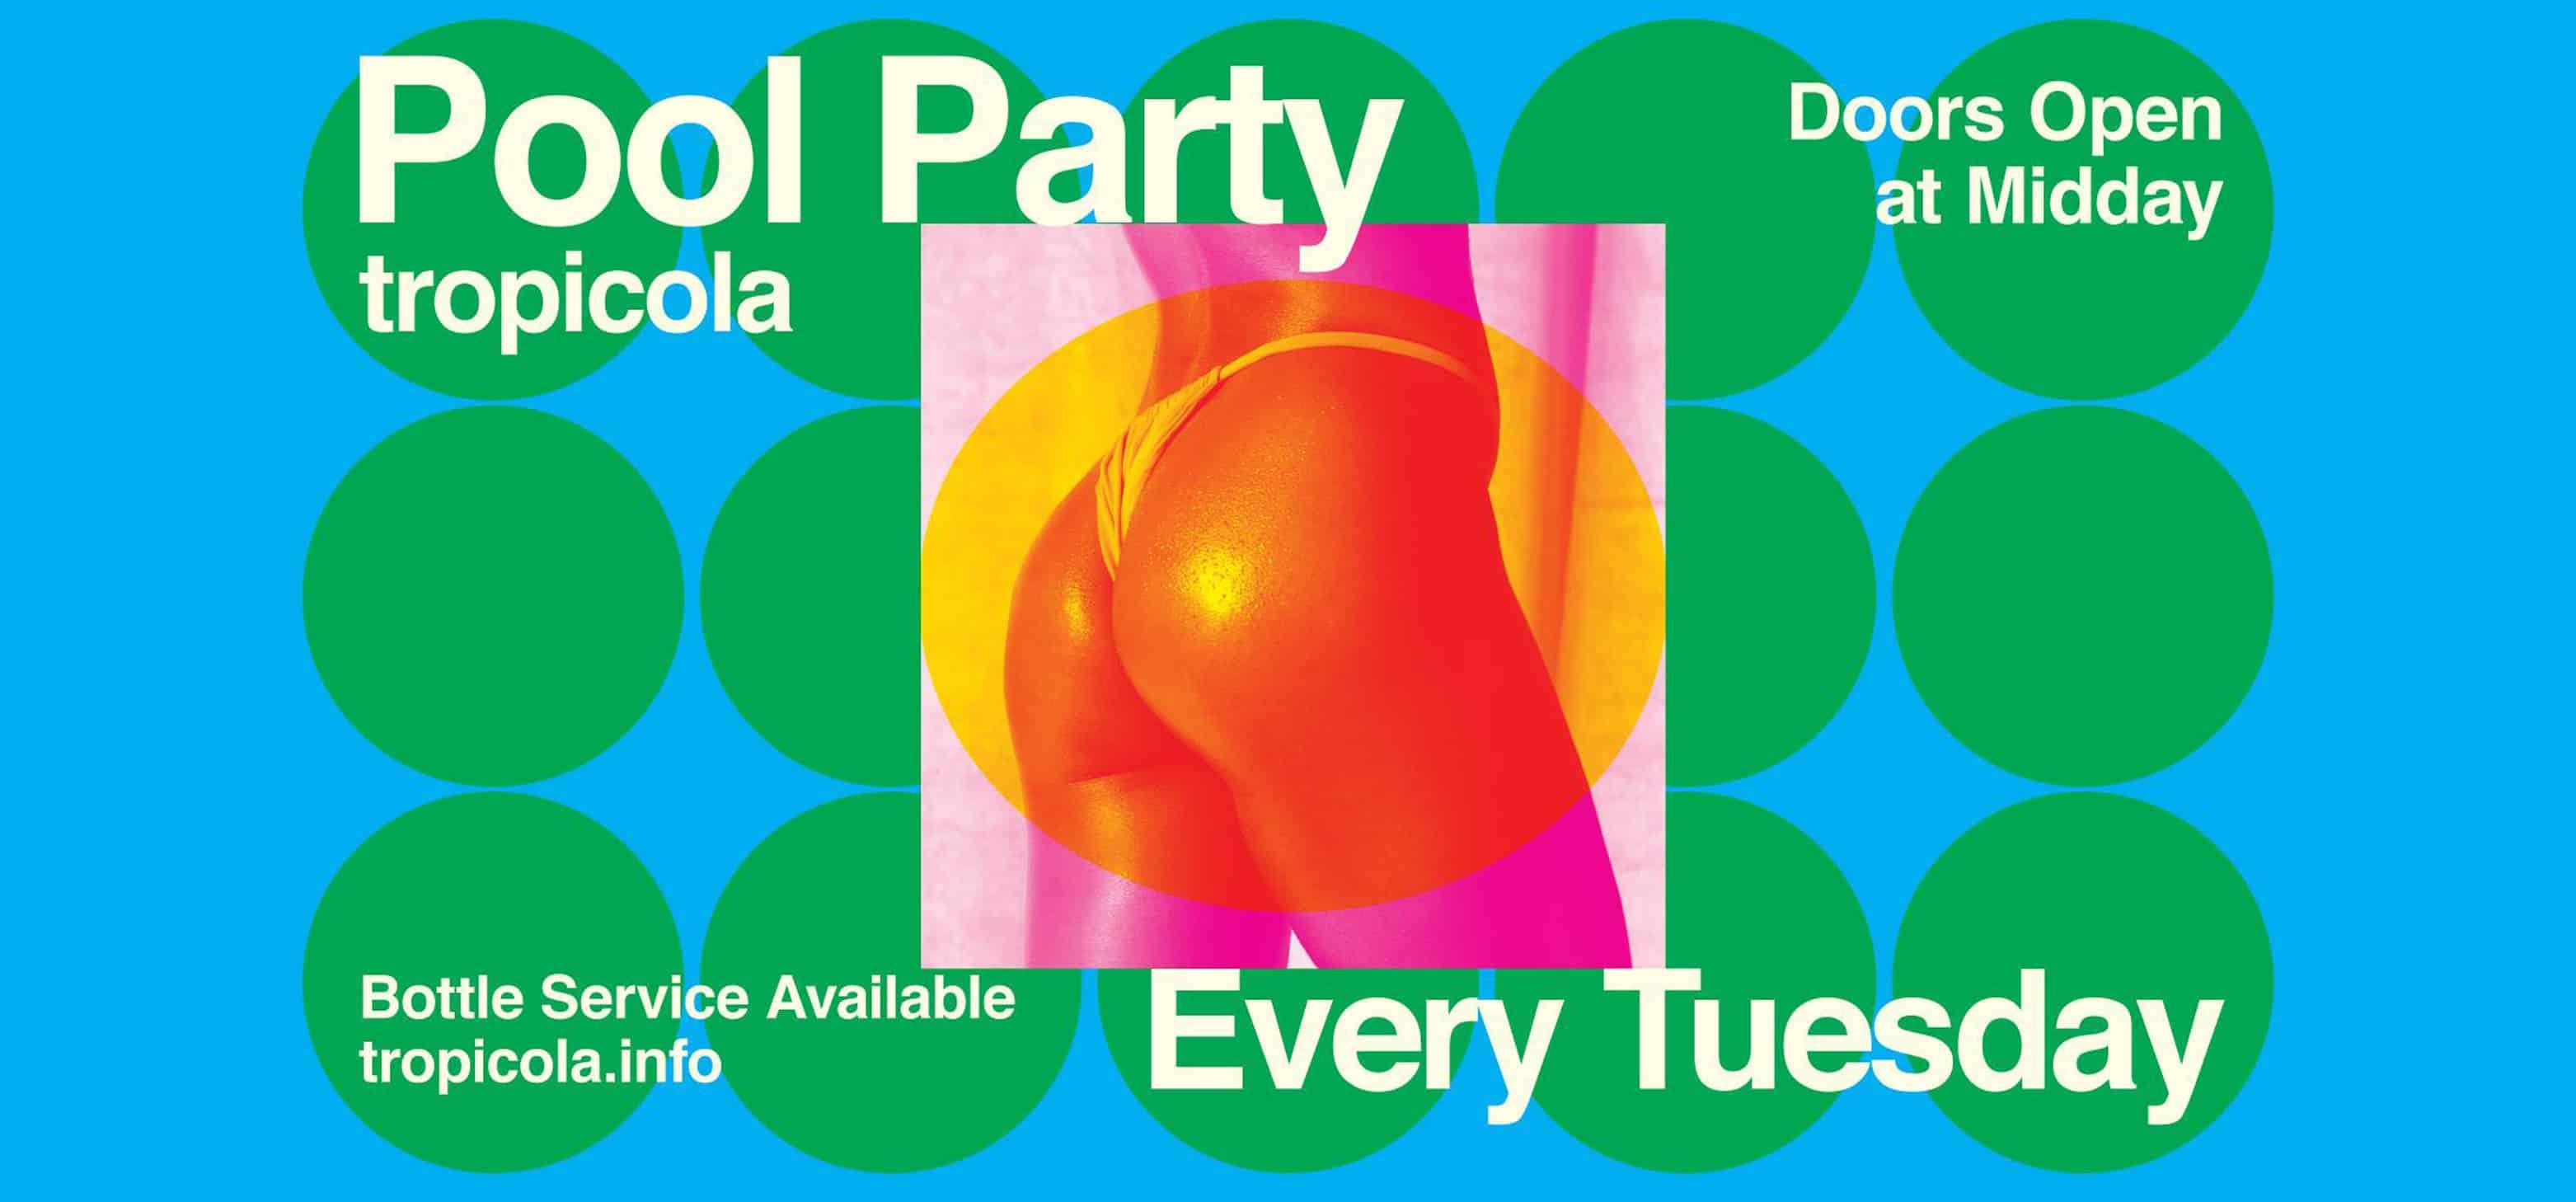 TROPICOLA POOL PARTY